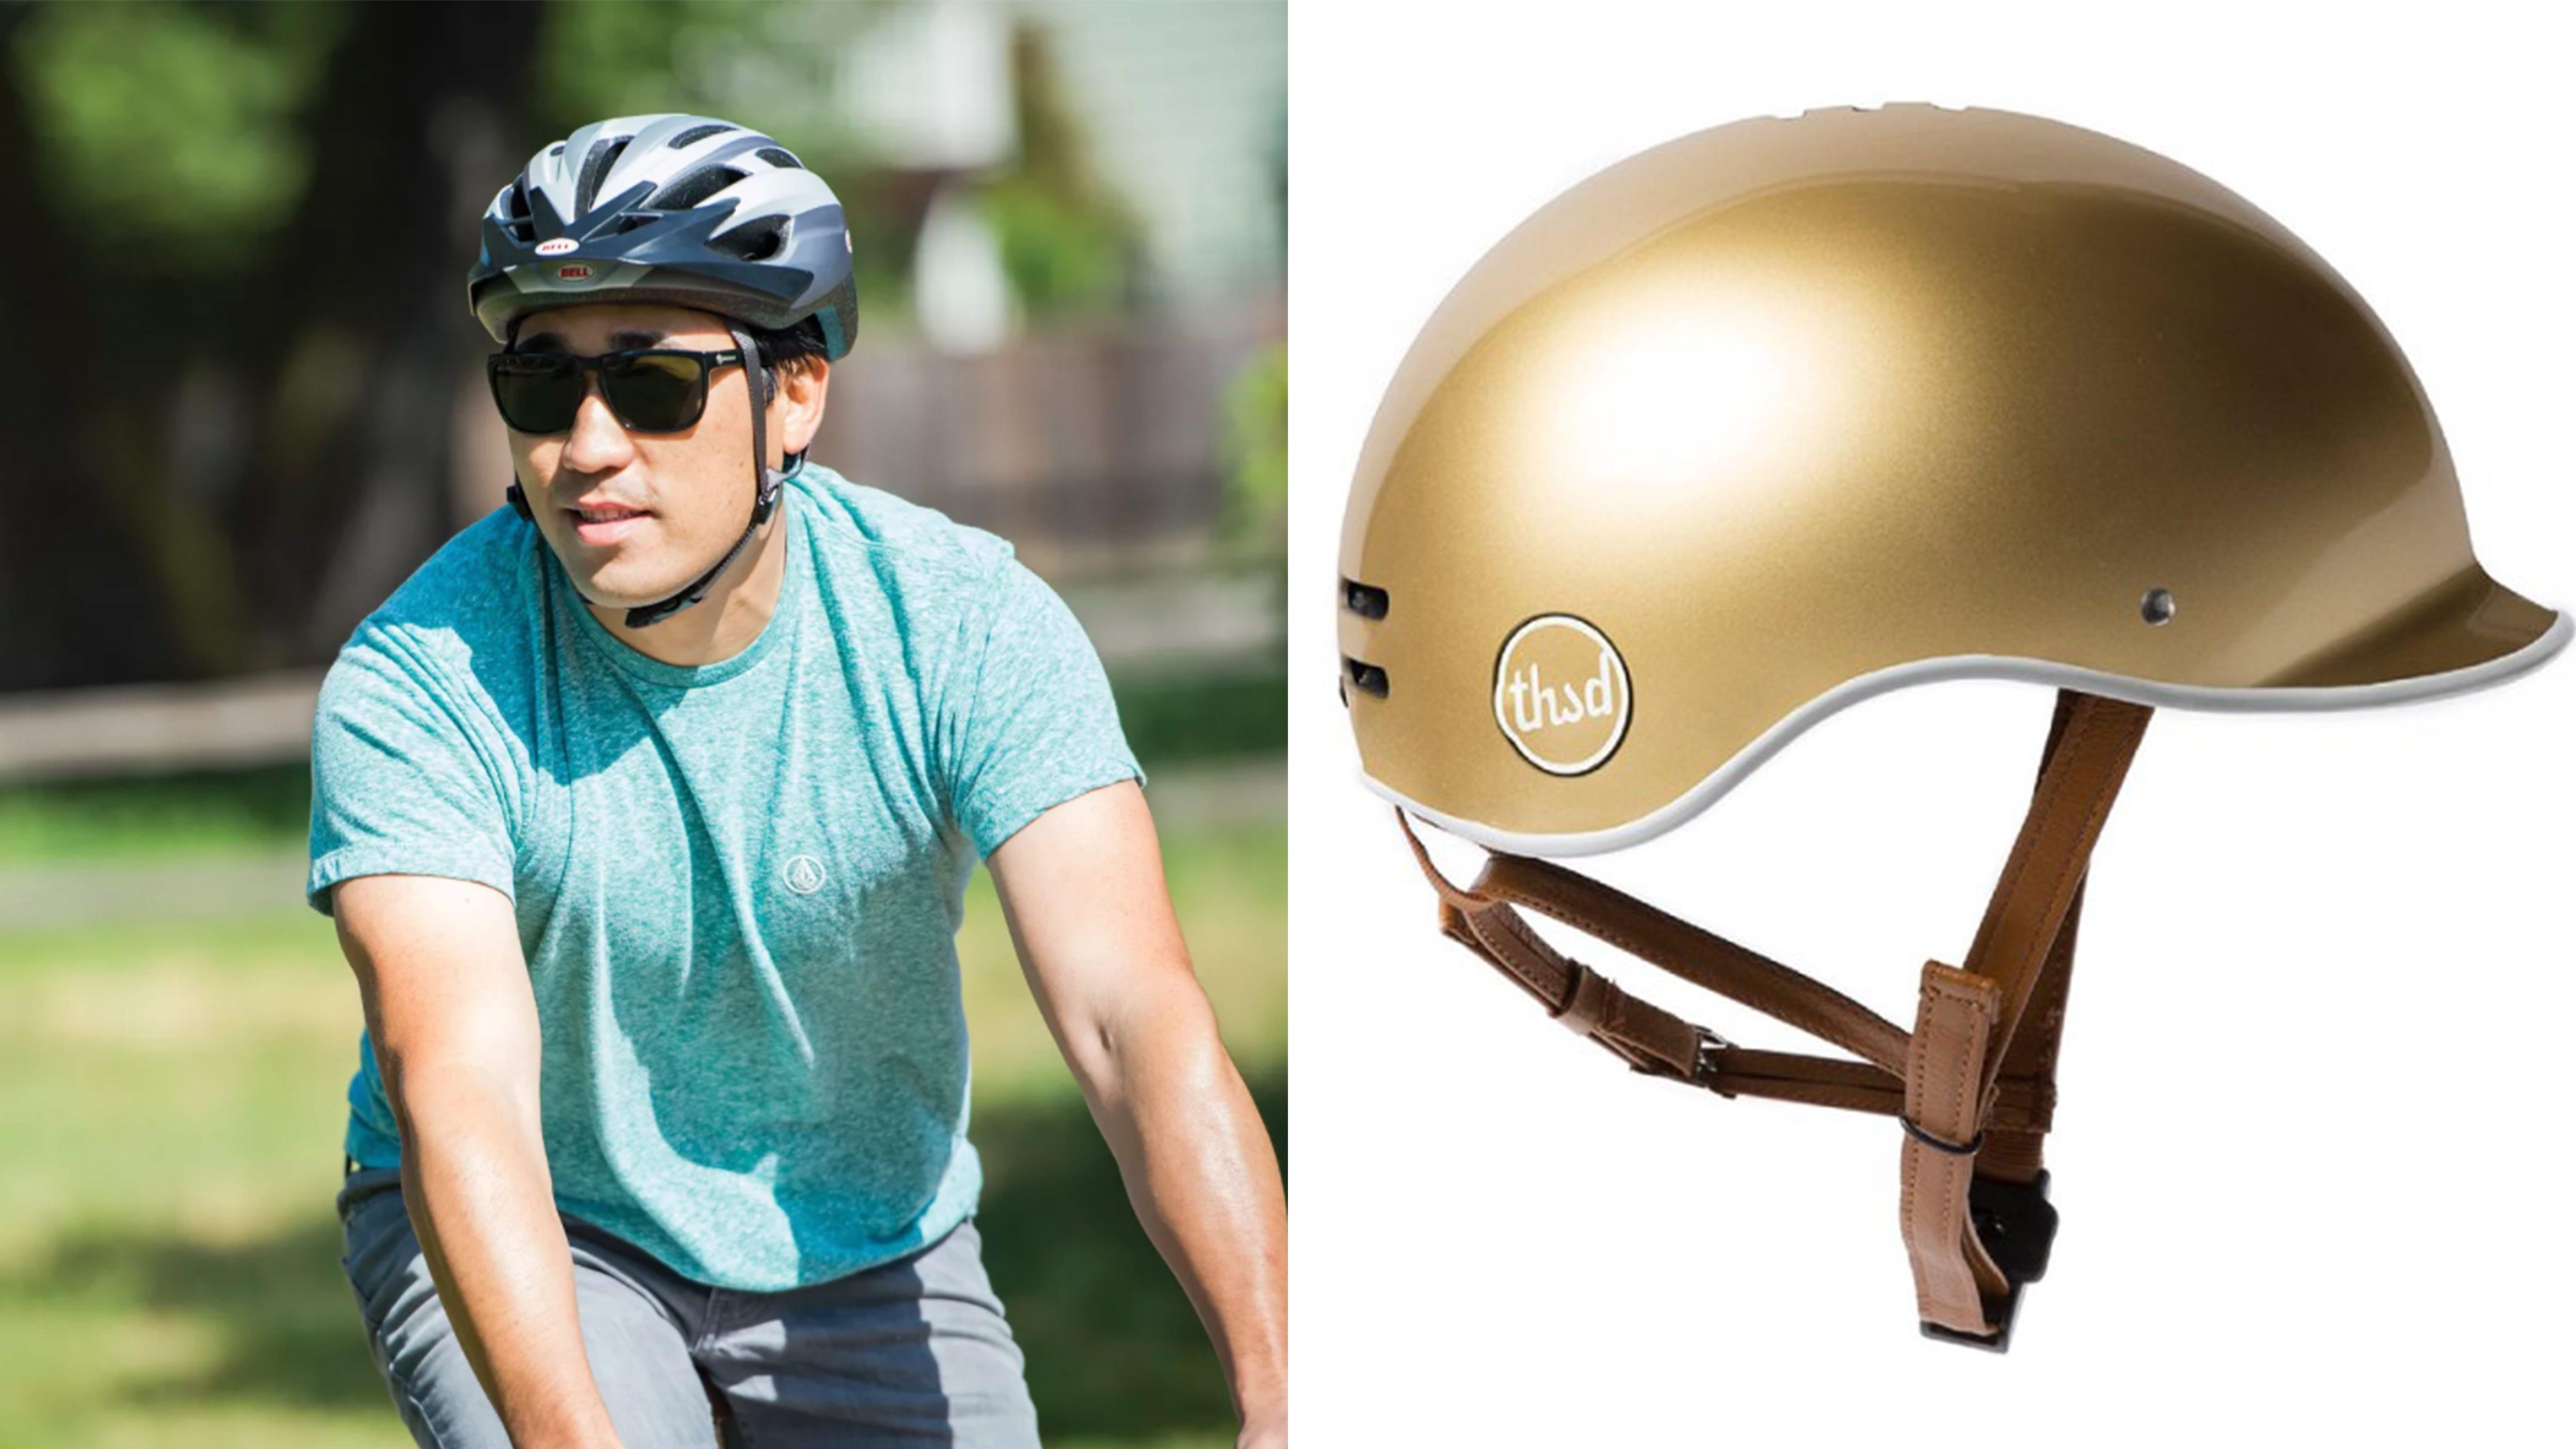 Adult Airflow Biking Helmet W// Detachable Visor Adjustable Strap Cycling Helmet